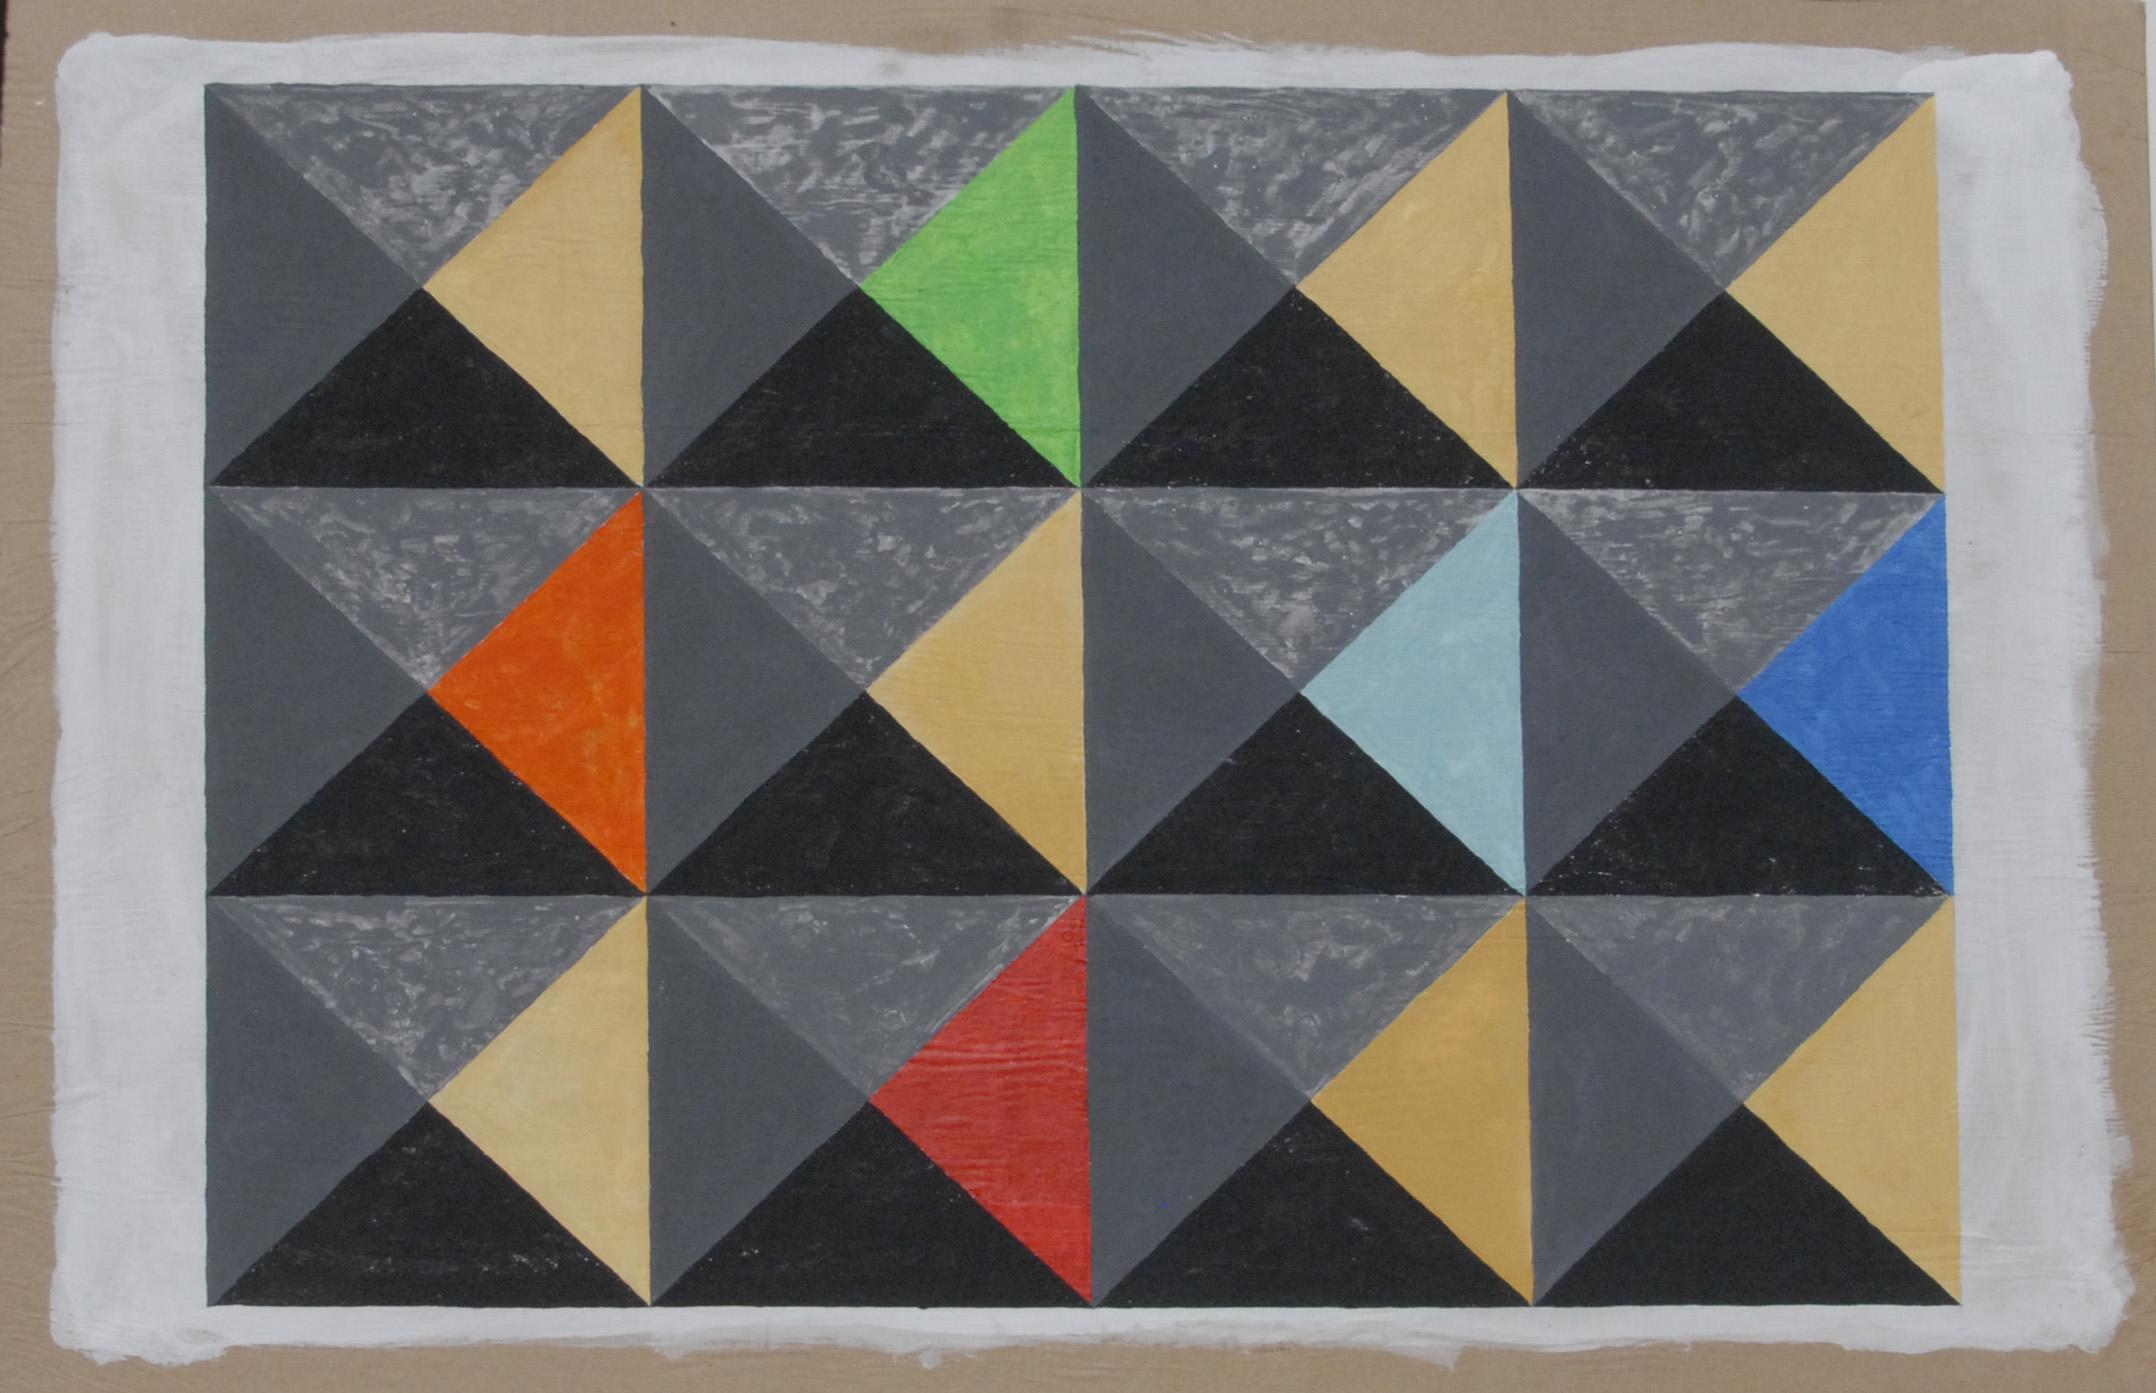 scansione piramidale 2, 2019, cm 100xH70